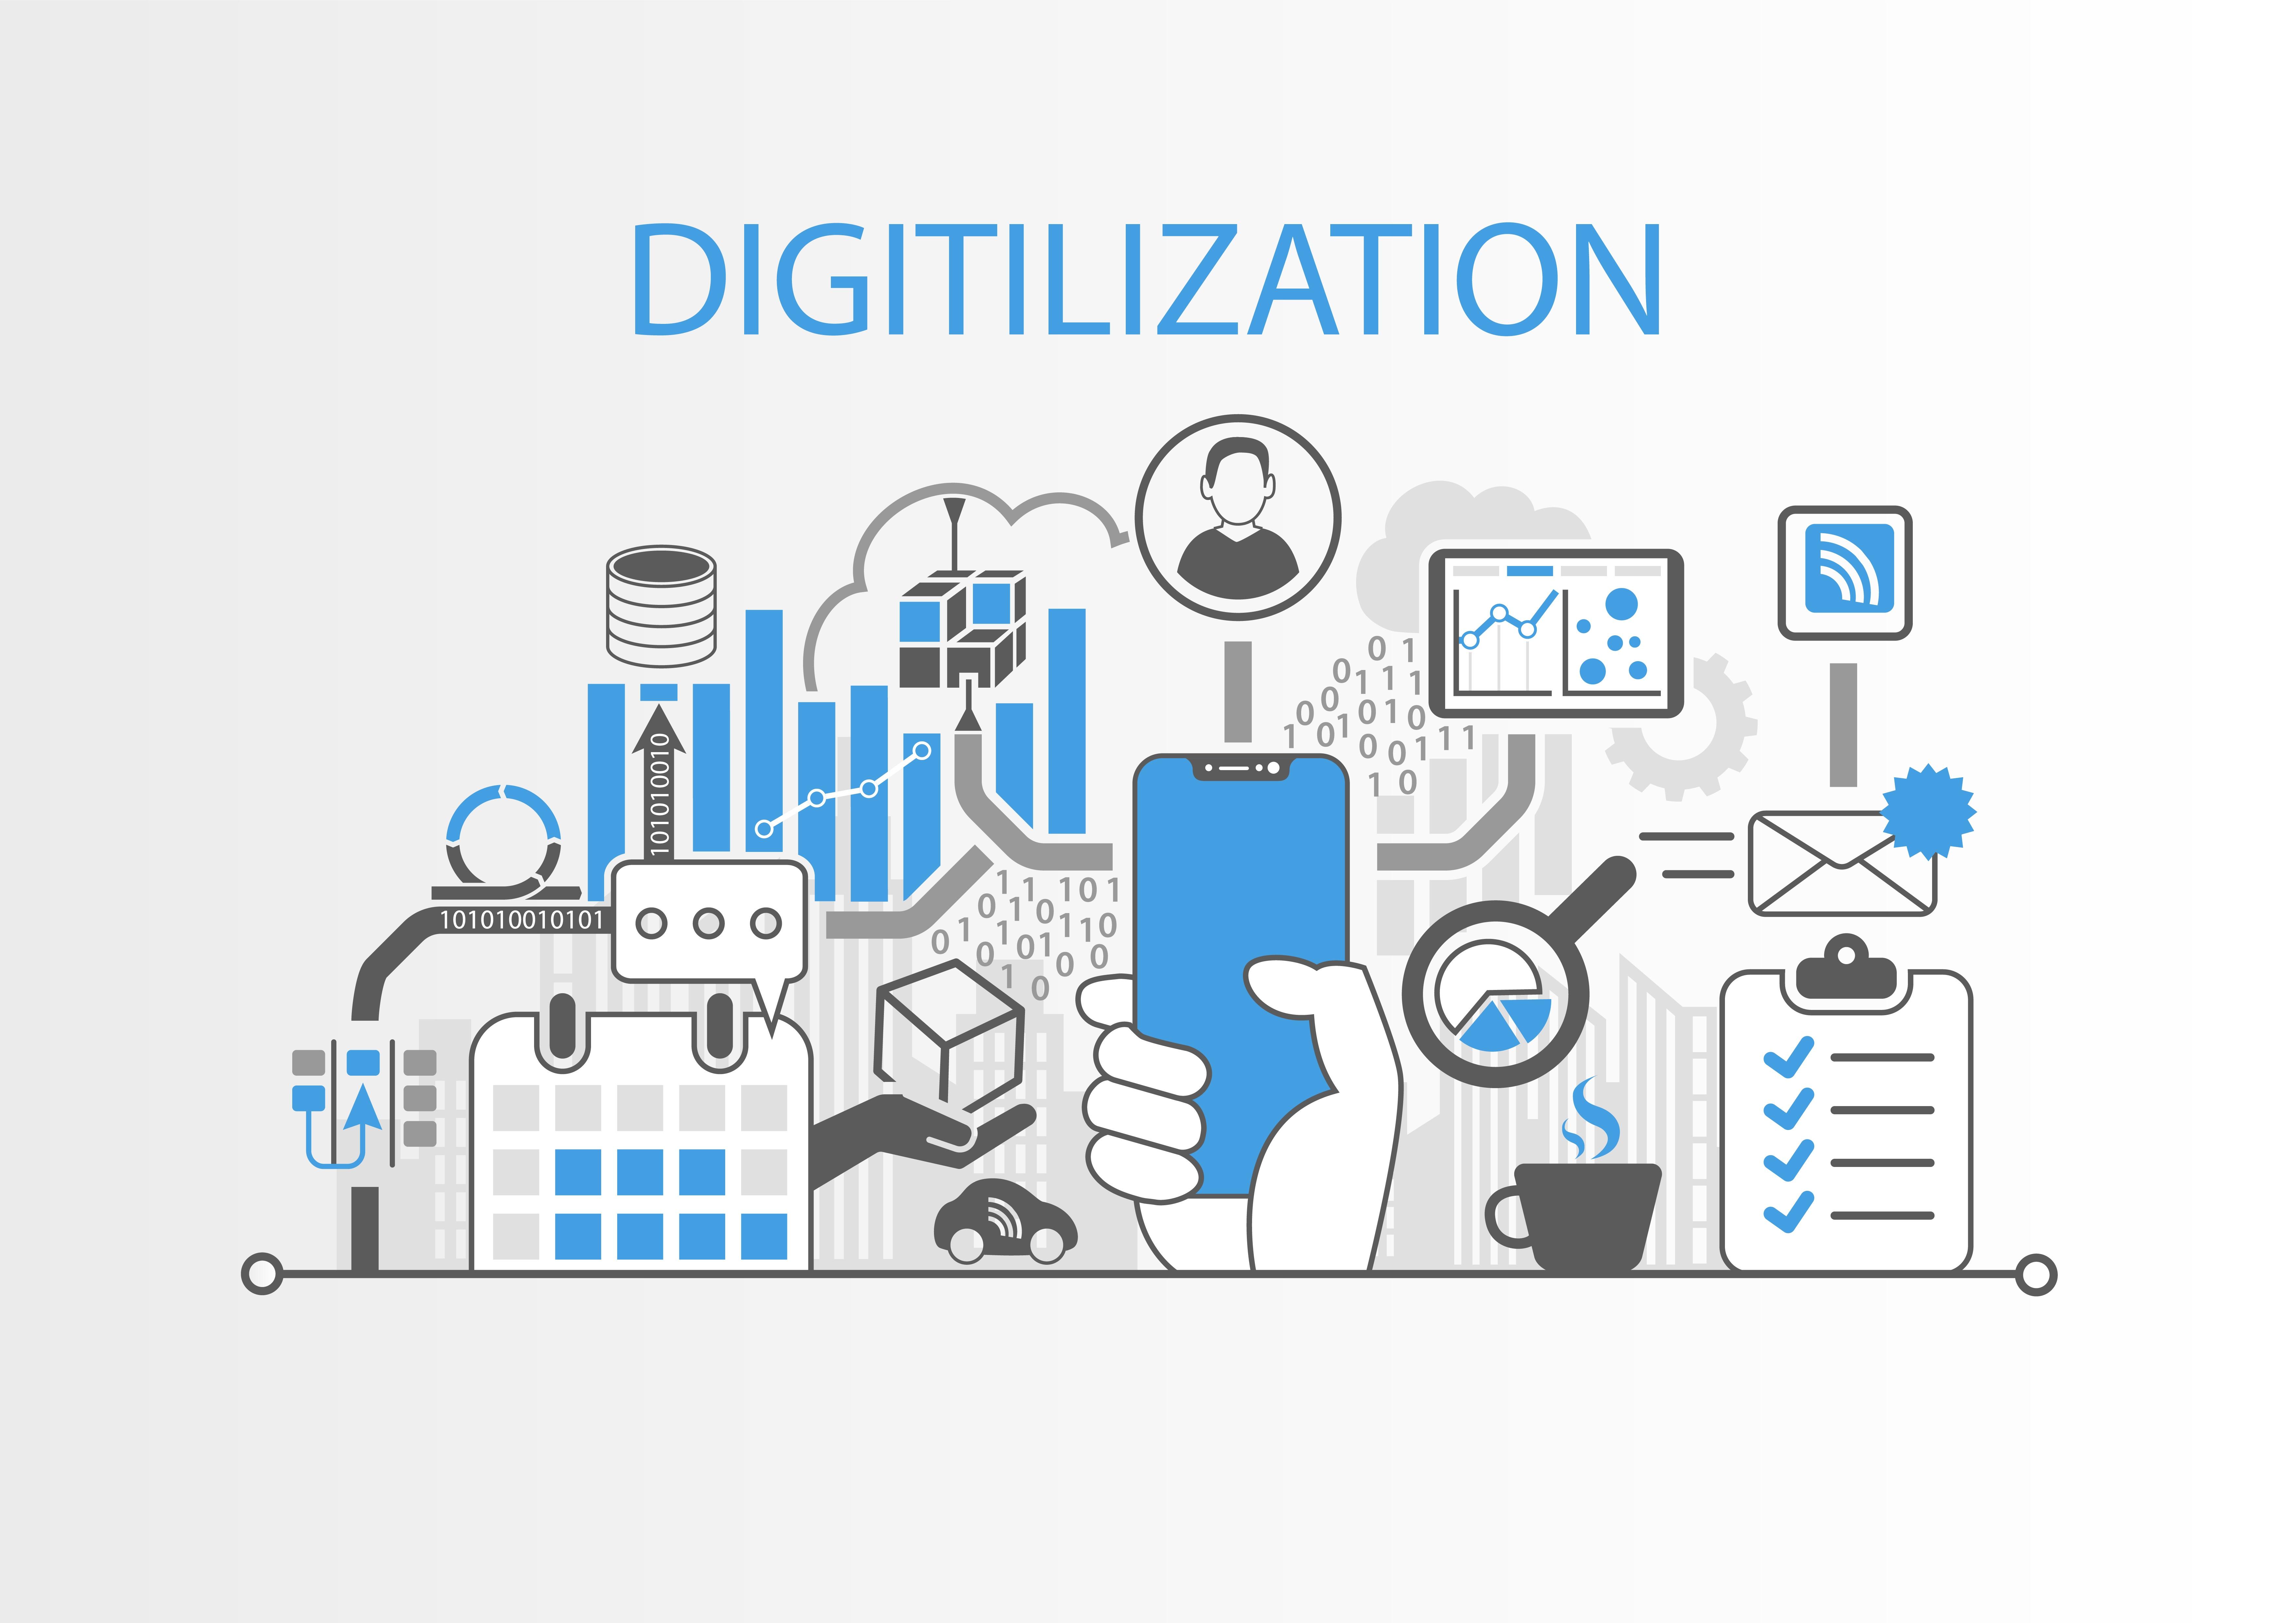 digitization-1